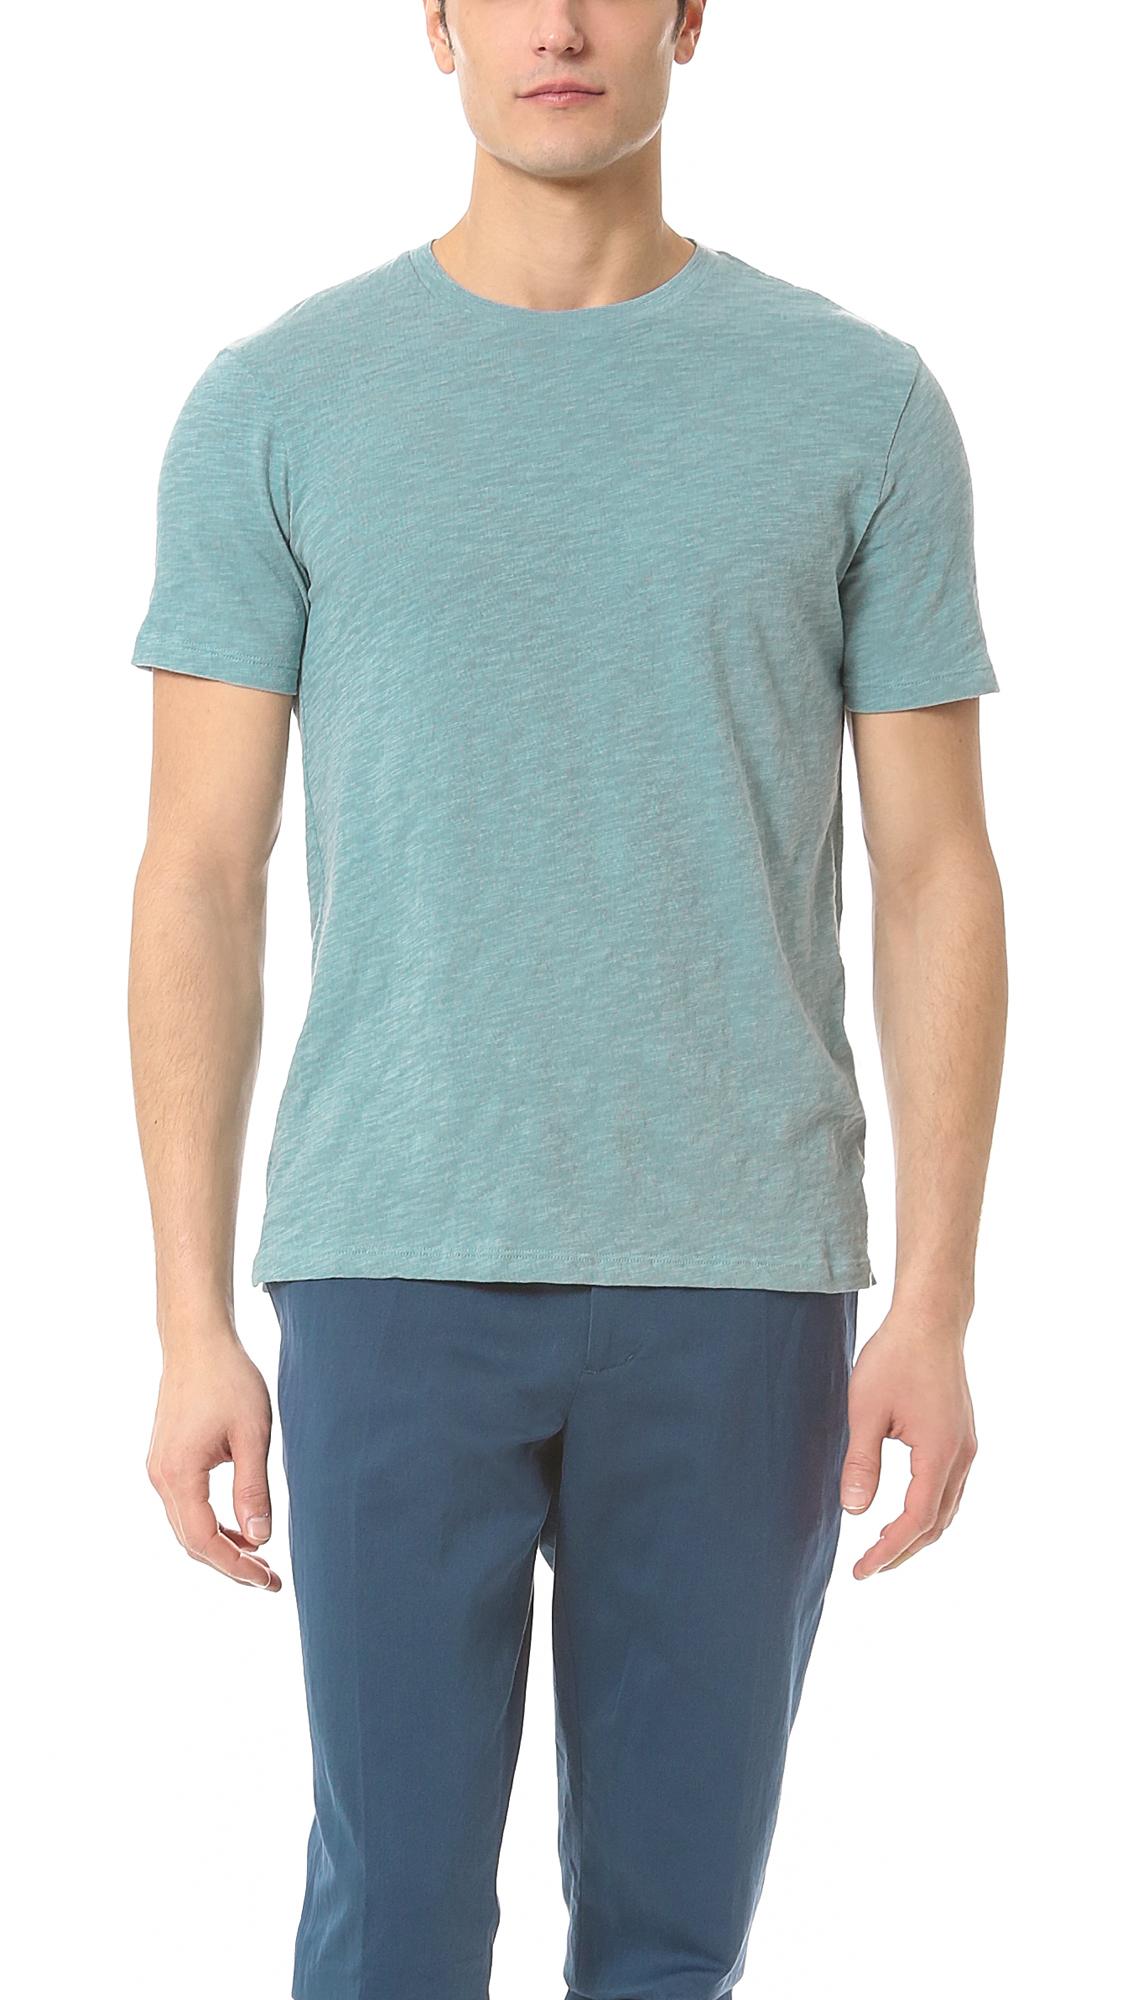 Vince slub t shirt in blue for men adriatic sea lyst for What is a slub shirt